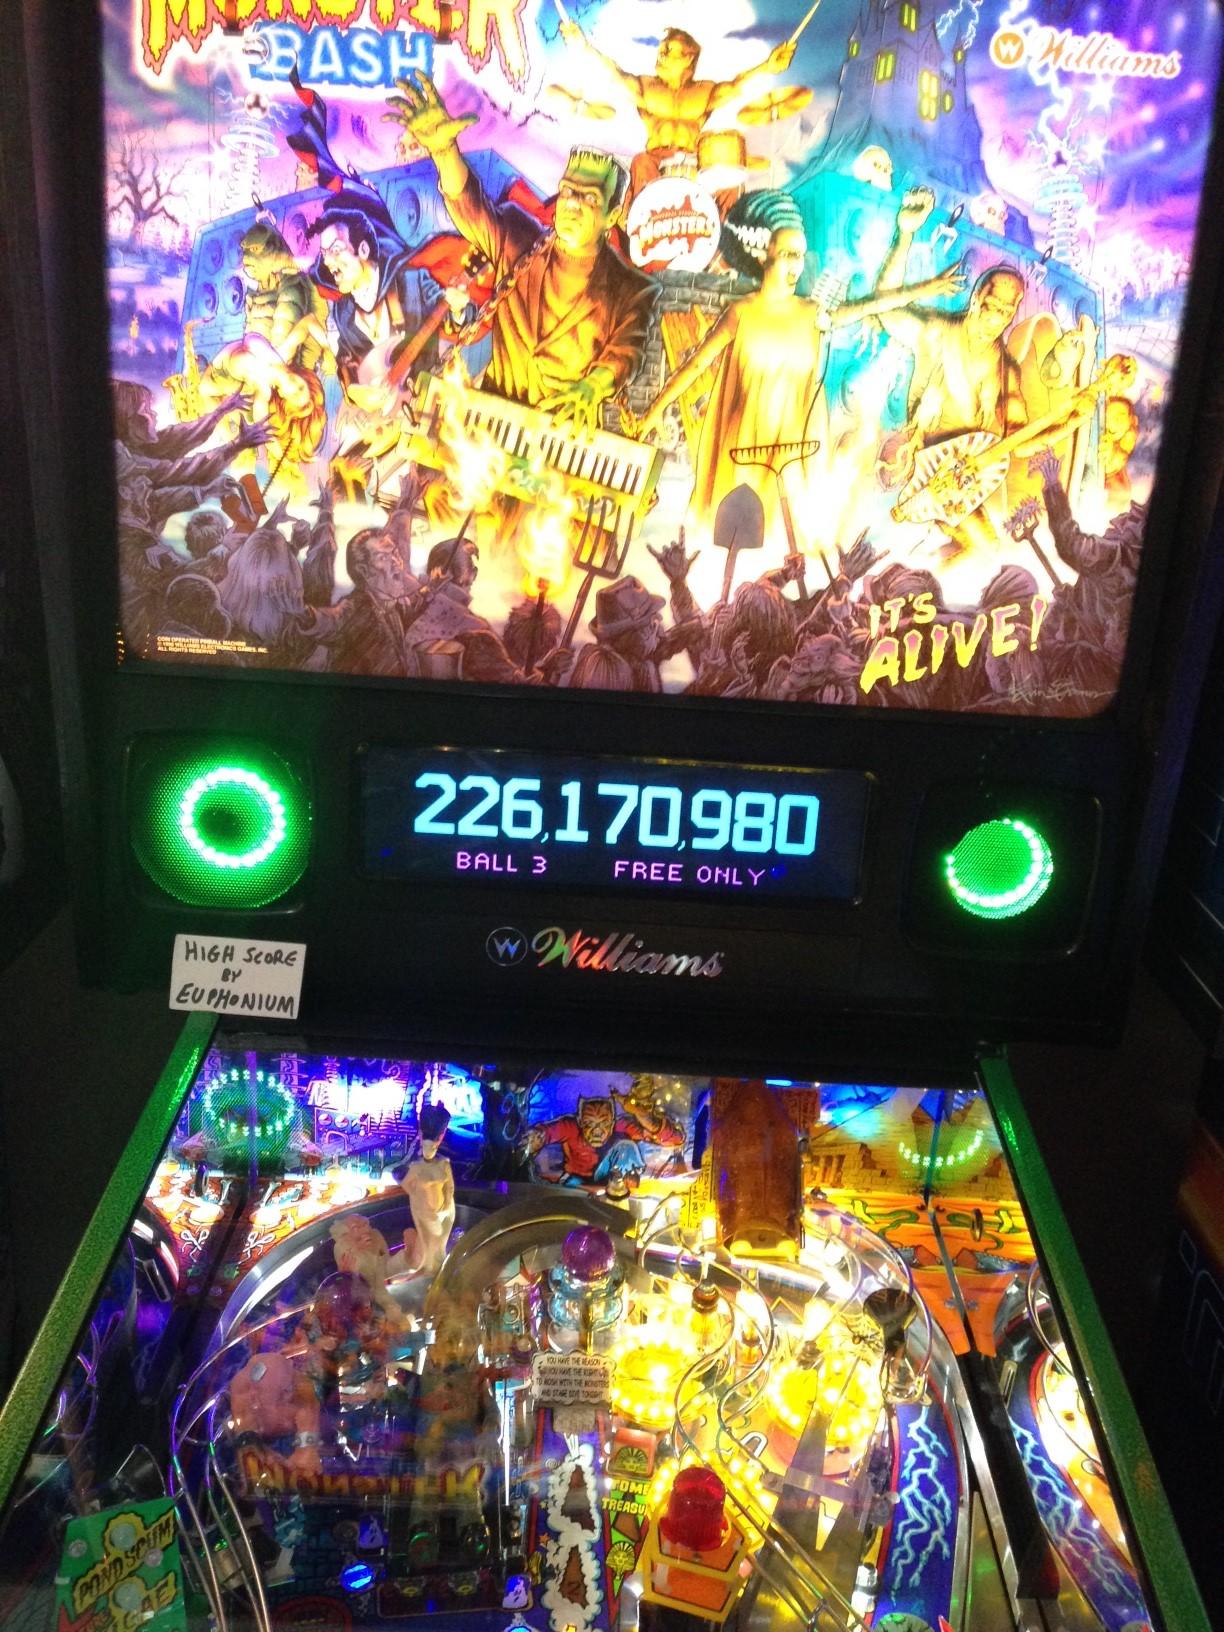 euphonium: Monster Bash (Pinball: 3 Balls) 229,629,030 points on 2017-06-27 21:45:28